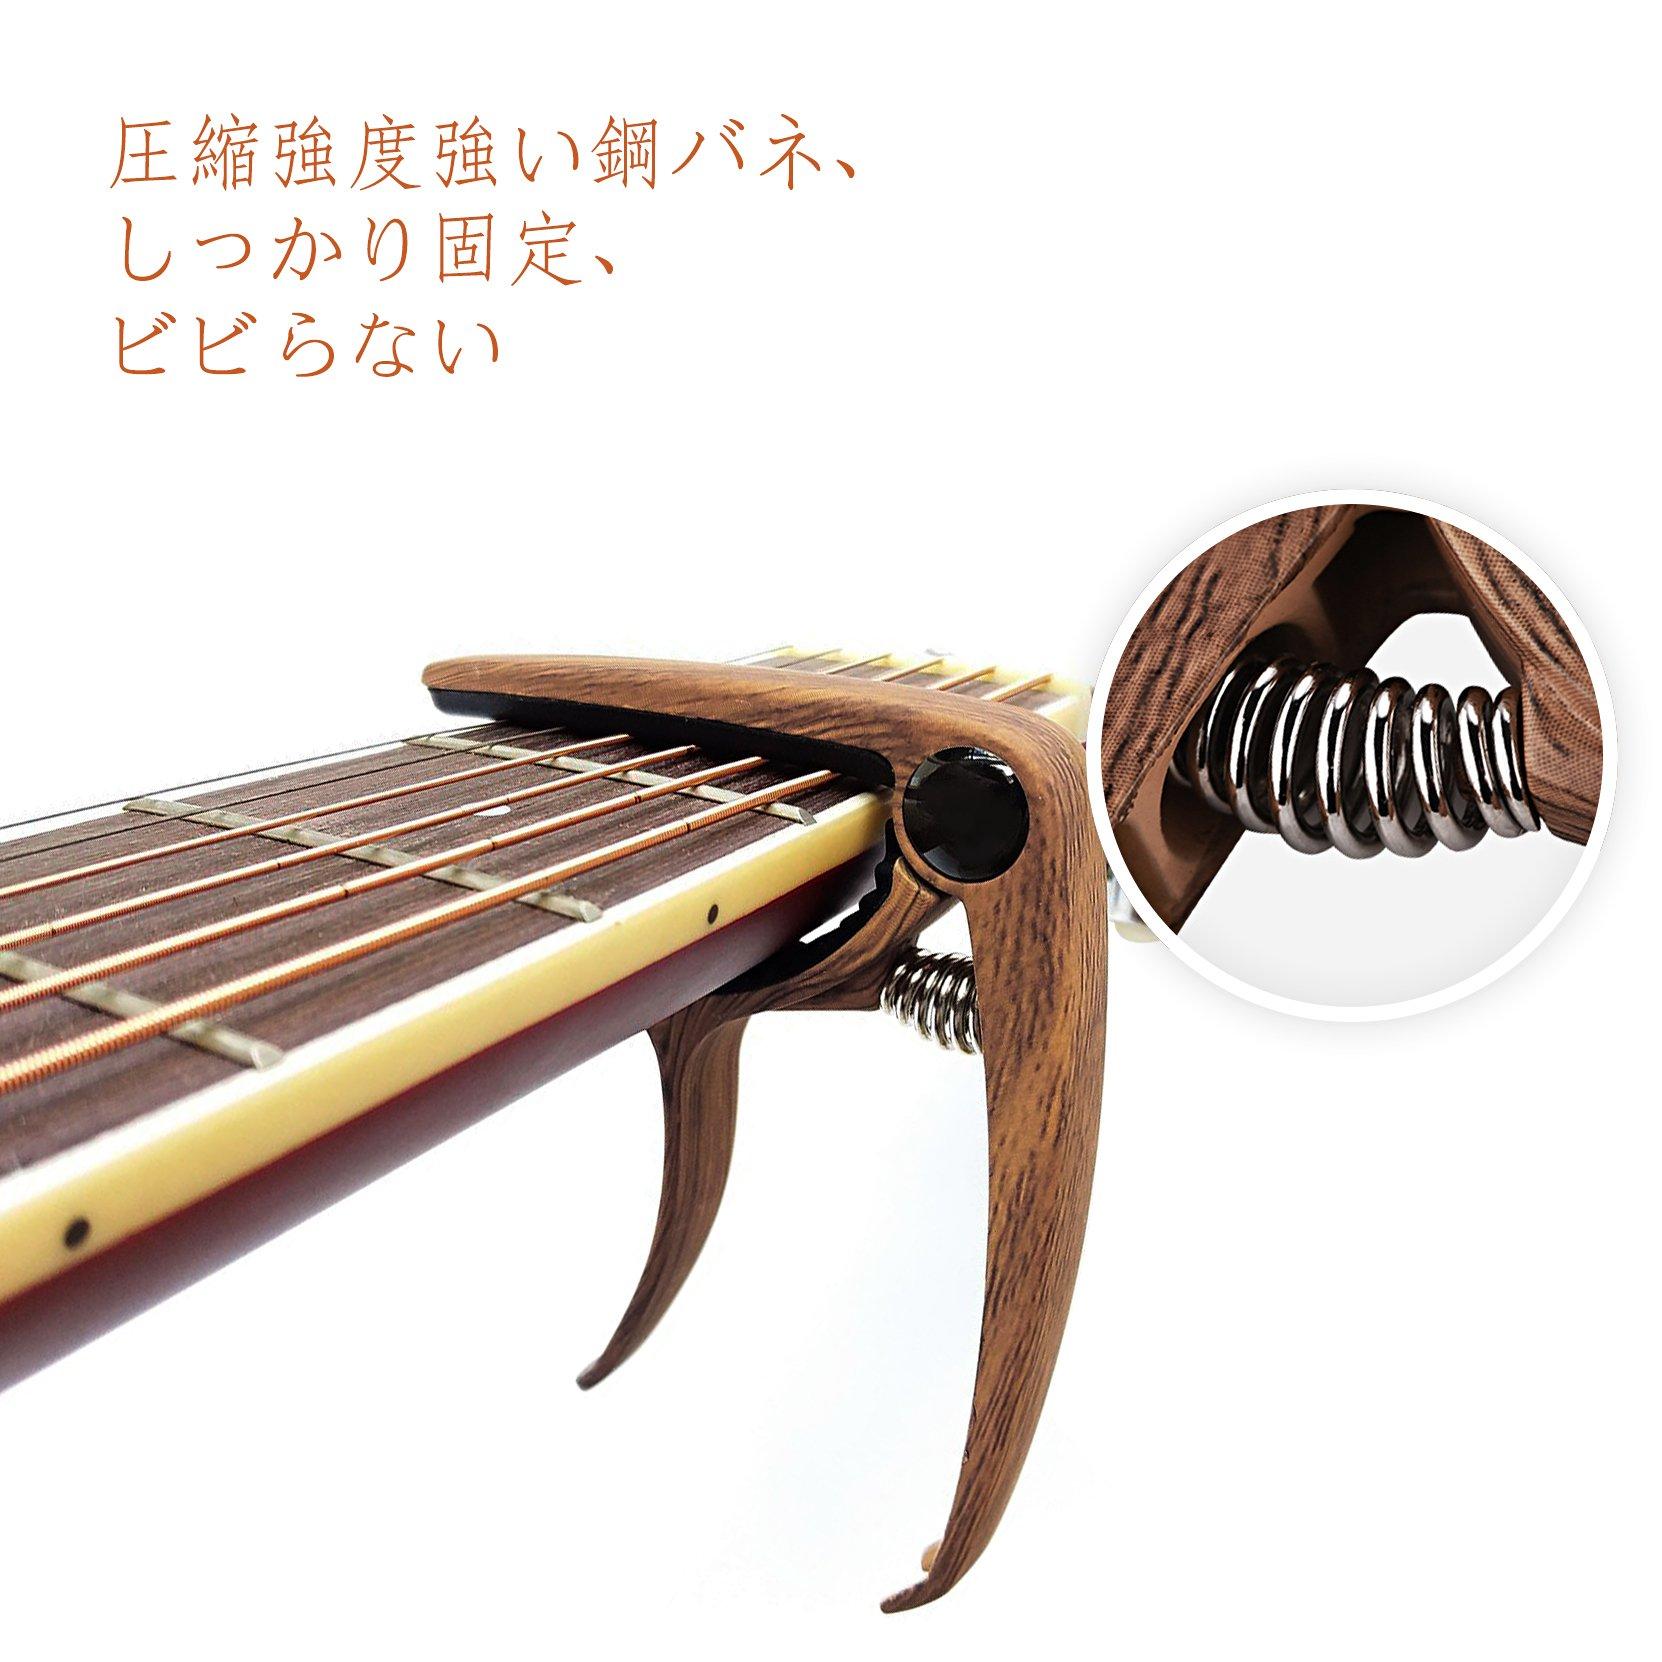 Hiveseen Cejilla Guitarra Capo, 6/12 Cuerdas, Aleación Zinc, con ...